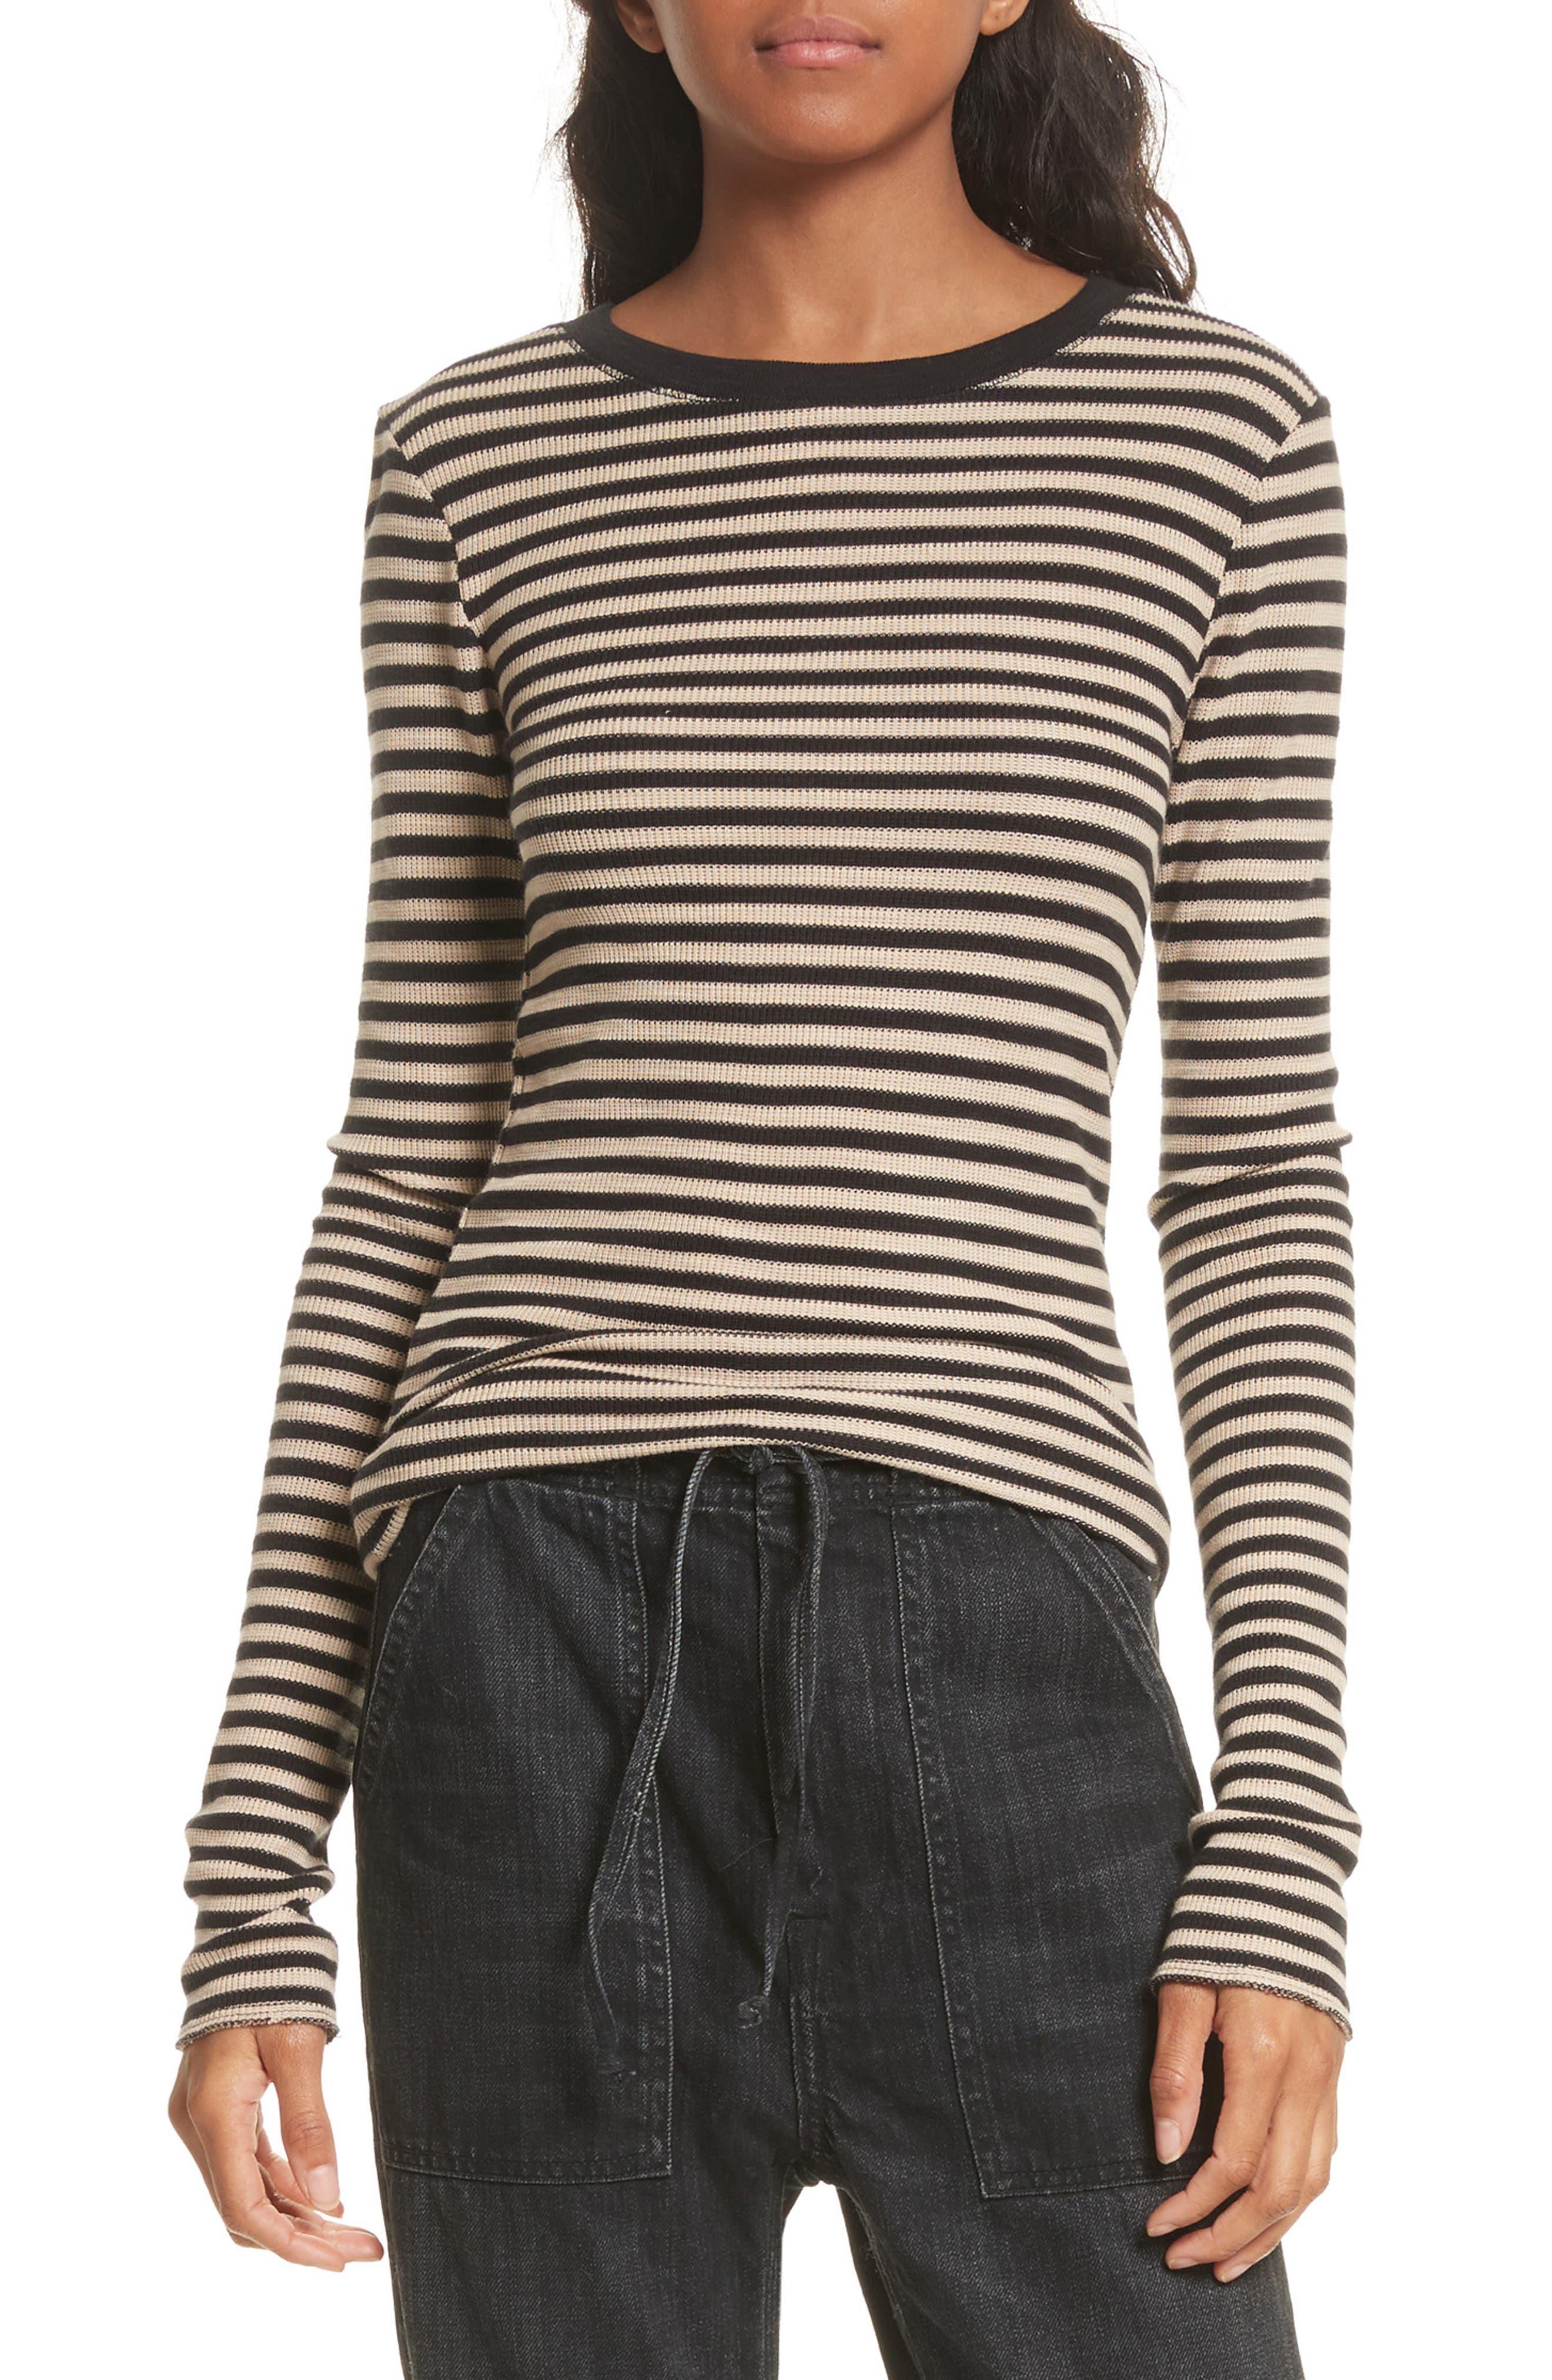 Main Image - Vince Railroad Stripe Crewneck Sweater